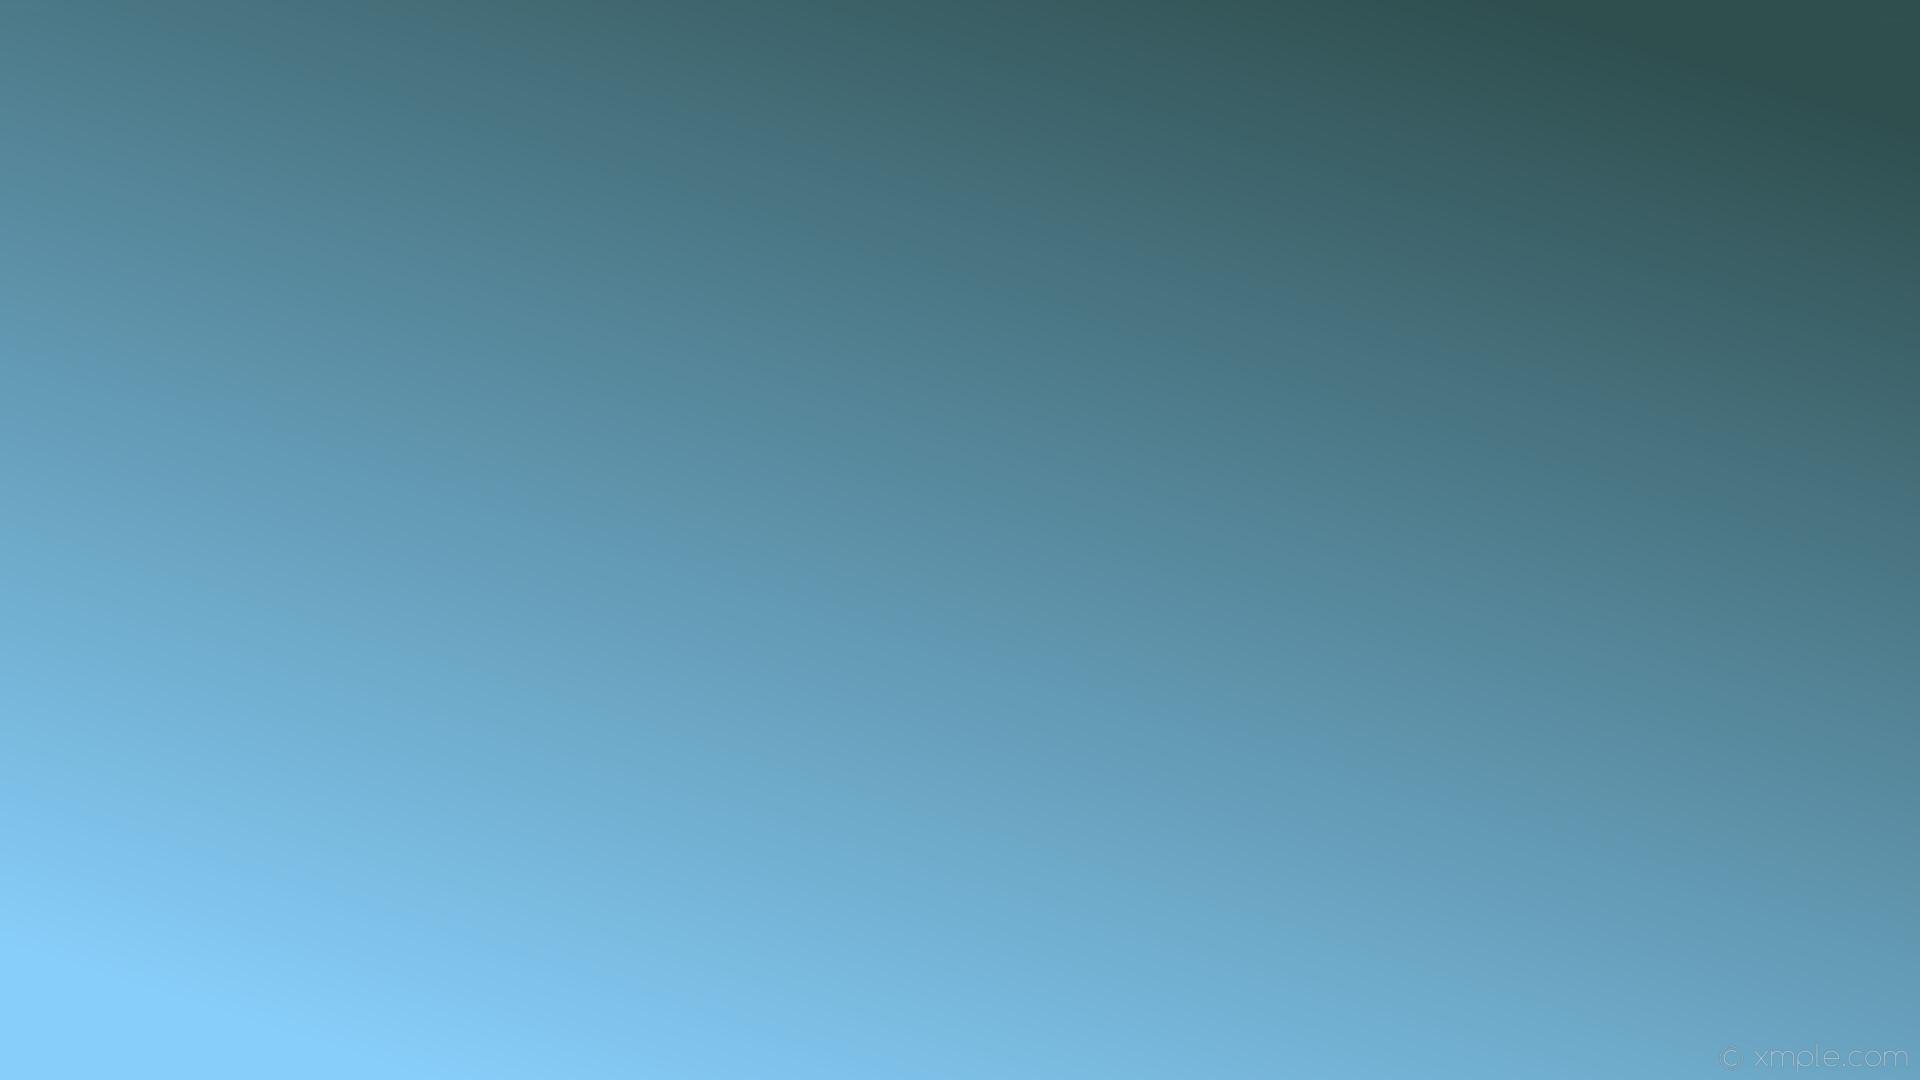 wallpaper grey blue gradient linear light sky blue dark slate gray #87cefa  #2f4f4f 225